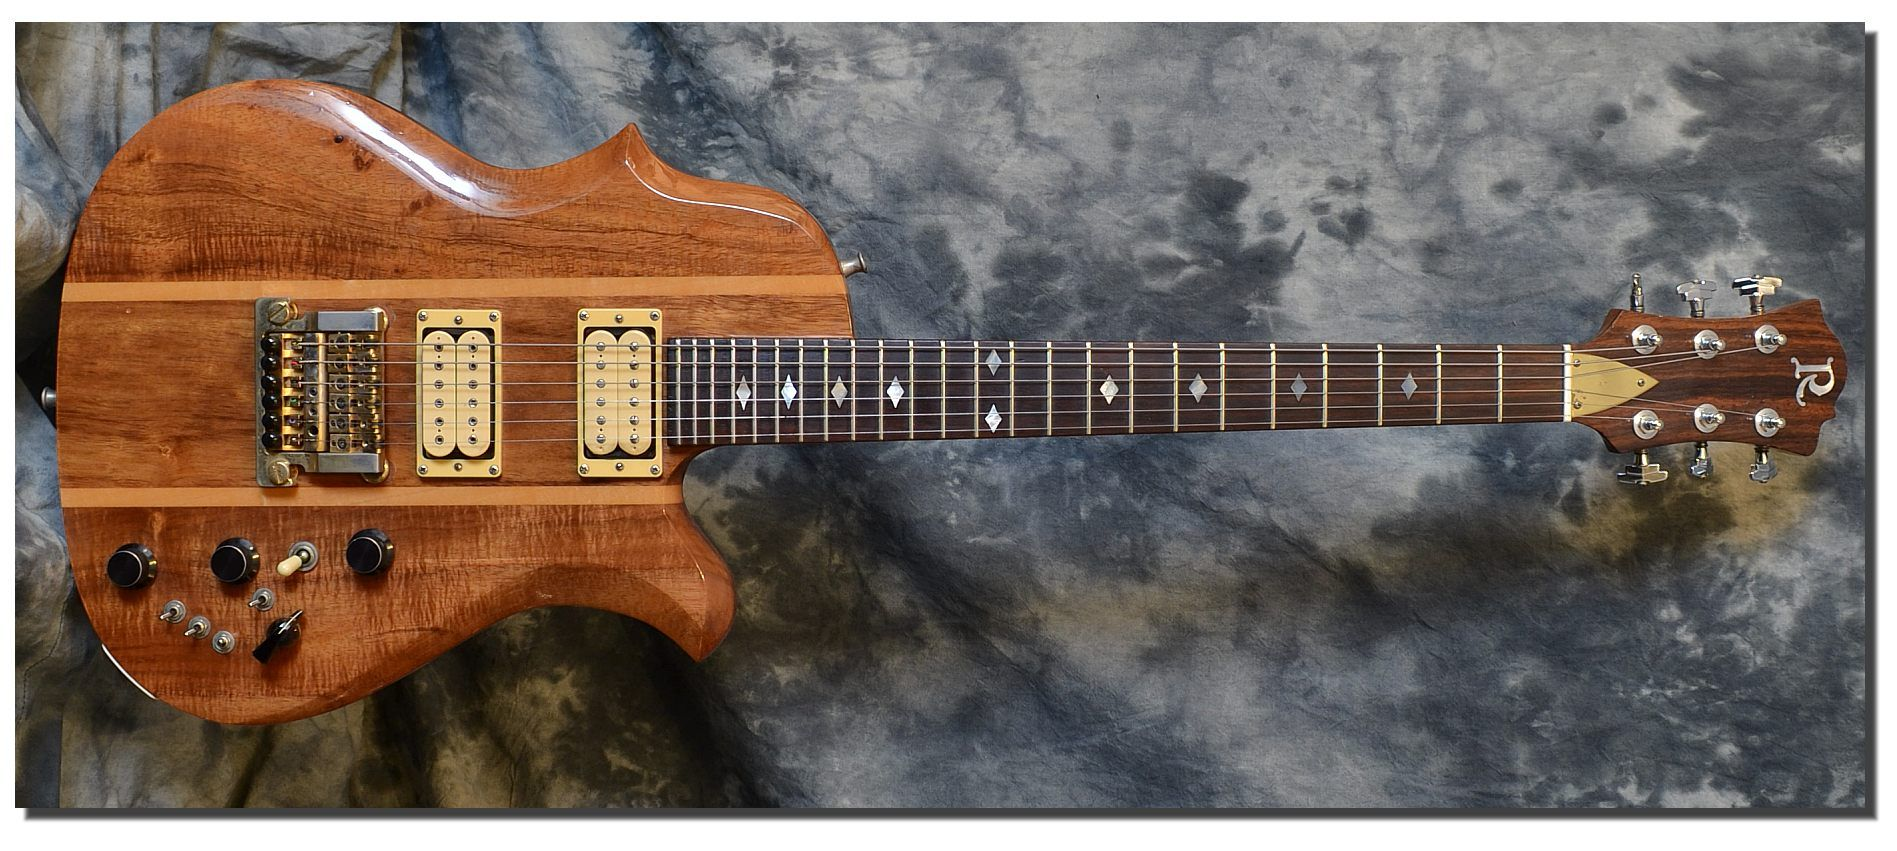 0fc1b67872fa1677824b9bfeb2f14036 1980 bc rich seagull guitars pinterest guitars, bass and bc rich eagle wiring diagram at gsmportal.co